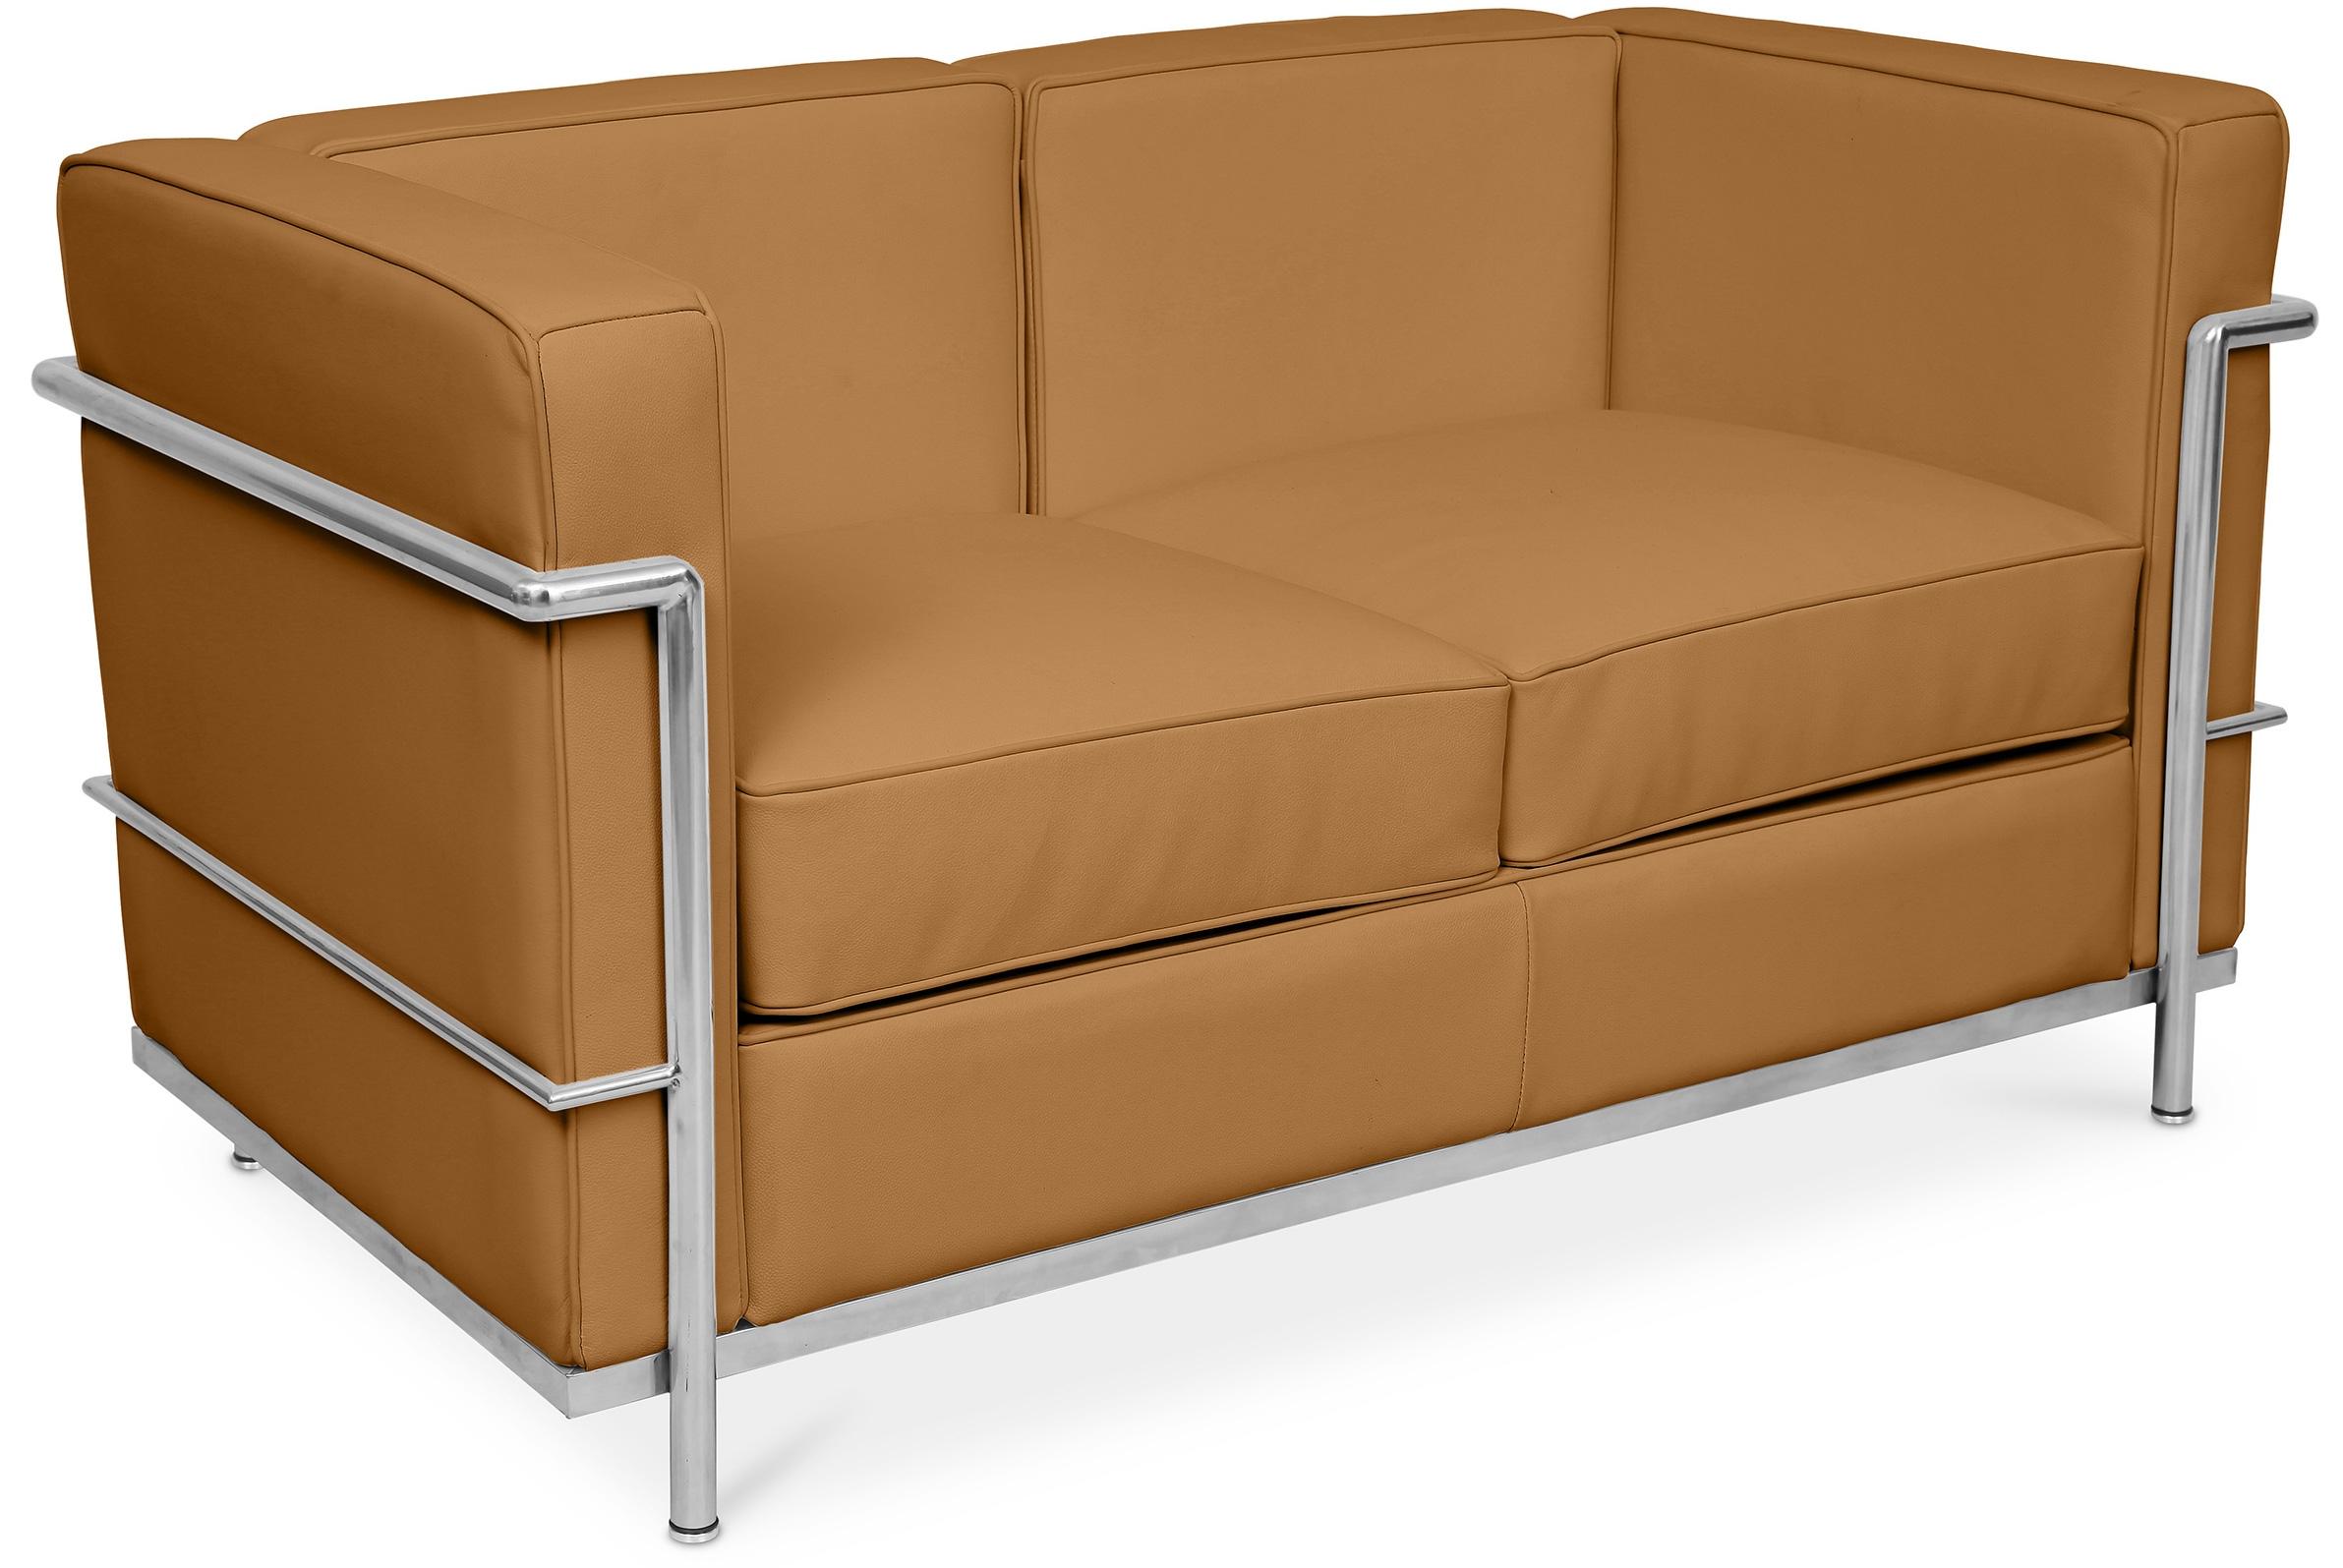 canap cuir camel 2 places l 132 inspir lc2. Black Bedroom Furniture Sets. Home Design Ideas